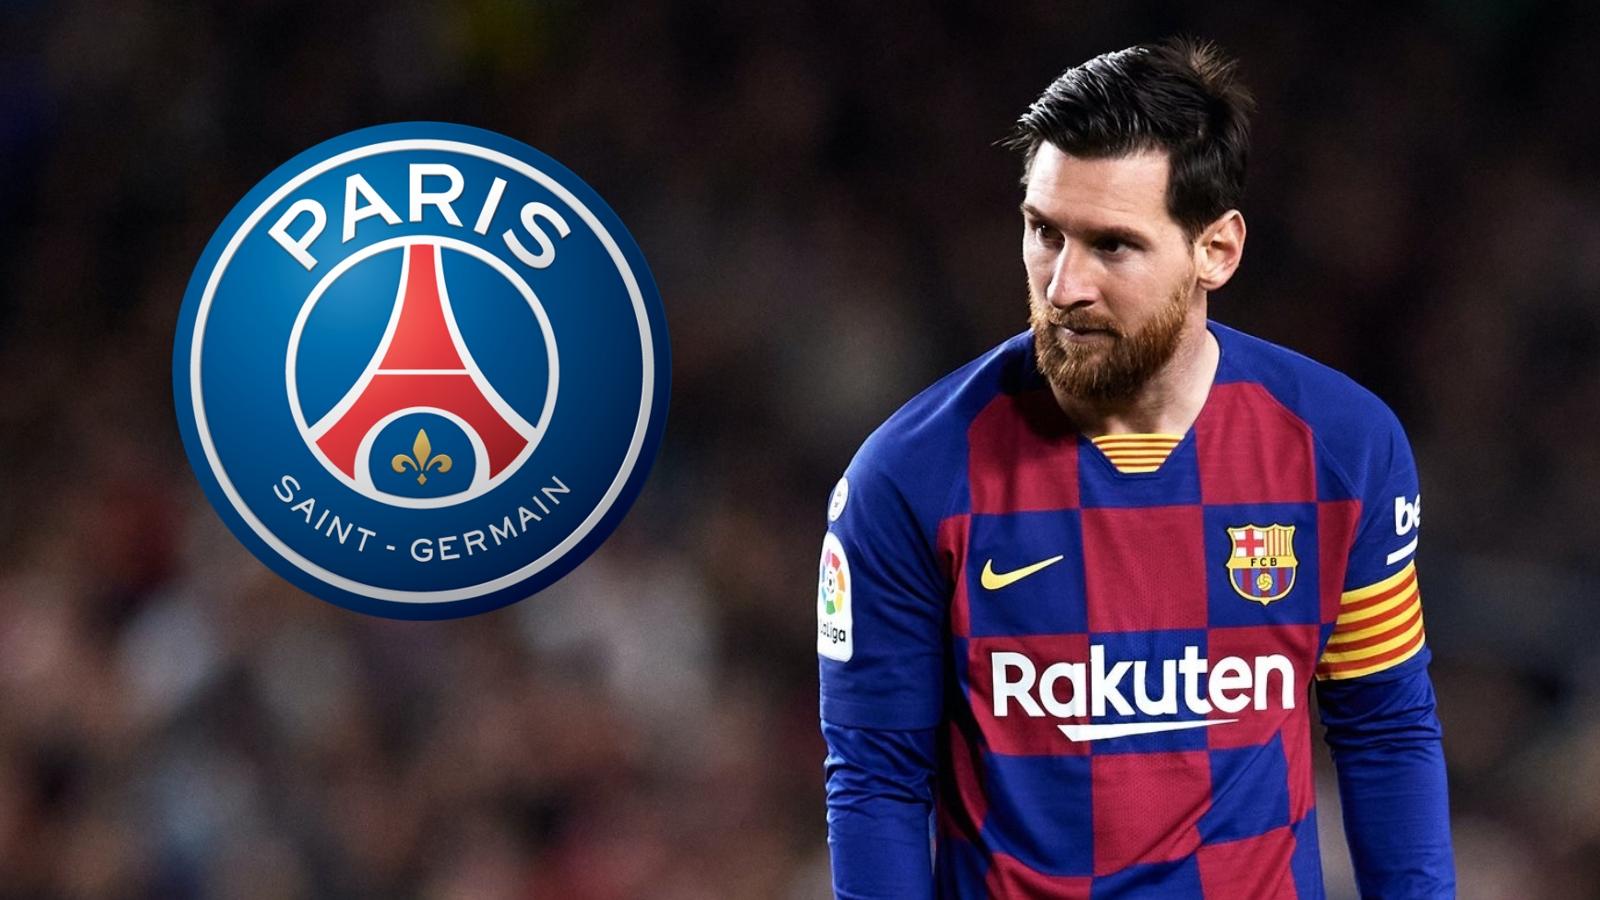 Lionel Messi Ke PSG? Mauricio Pochettino: Kami Sambut Semua Pemain Hebat! |  Goal.com